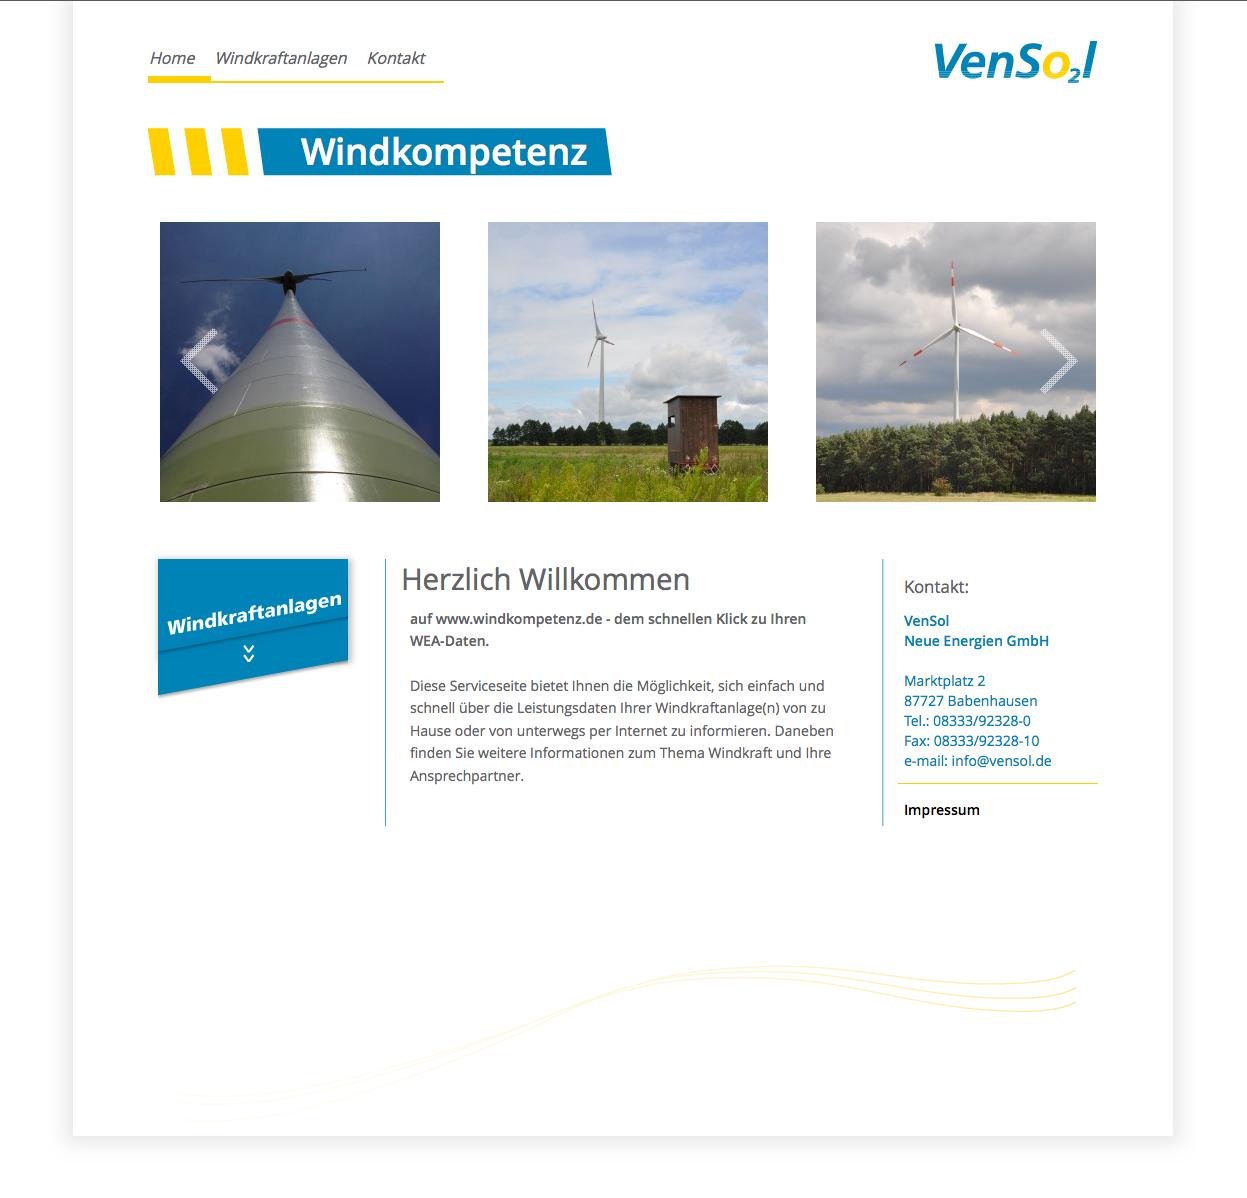 VenSol – Windkompetenz Infoplattform